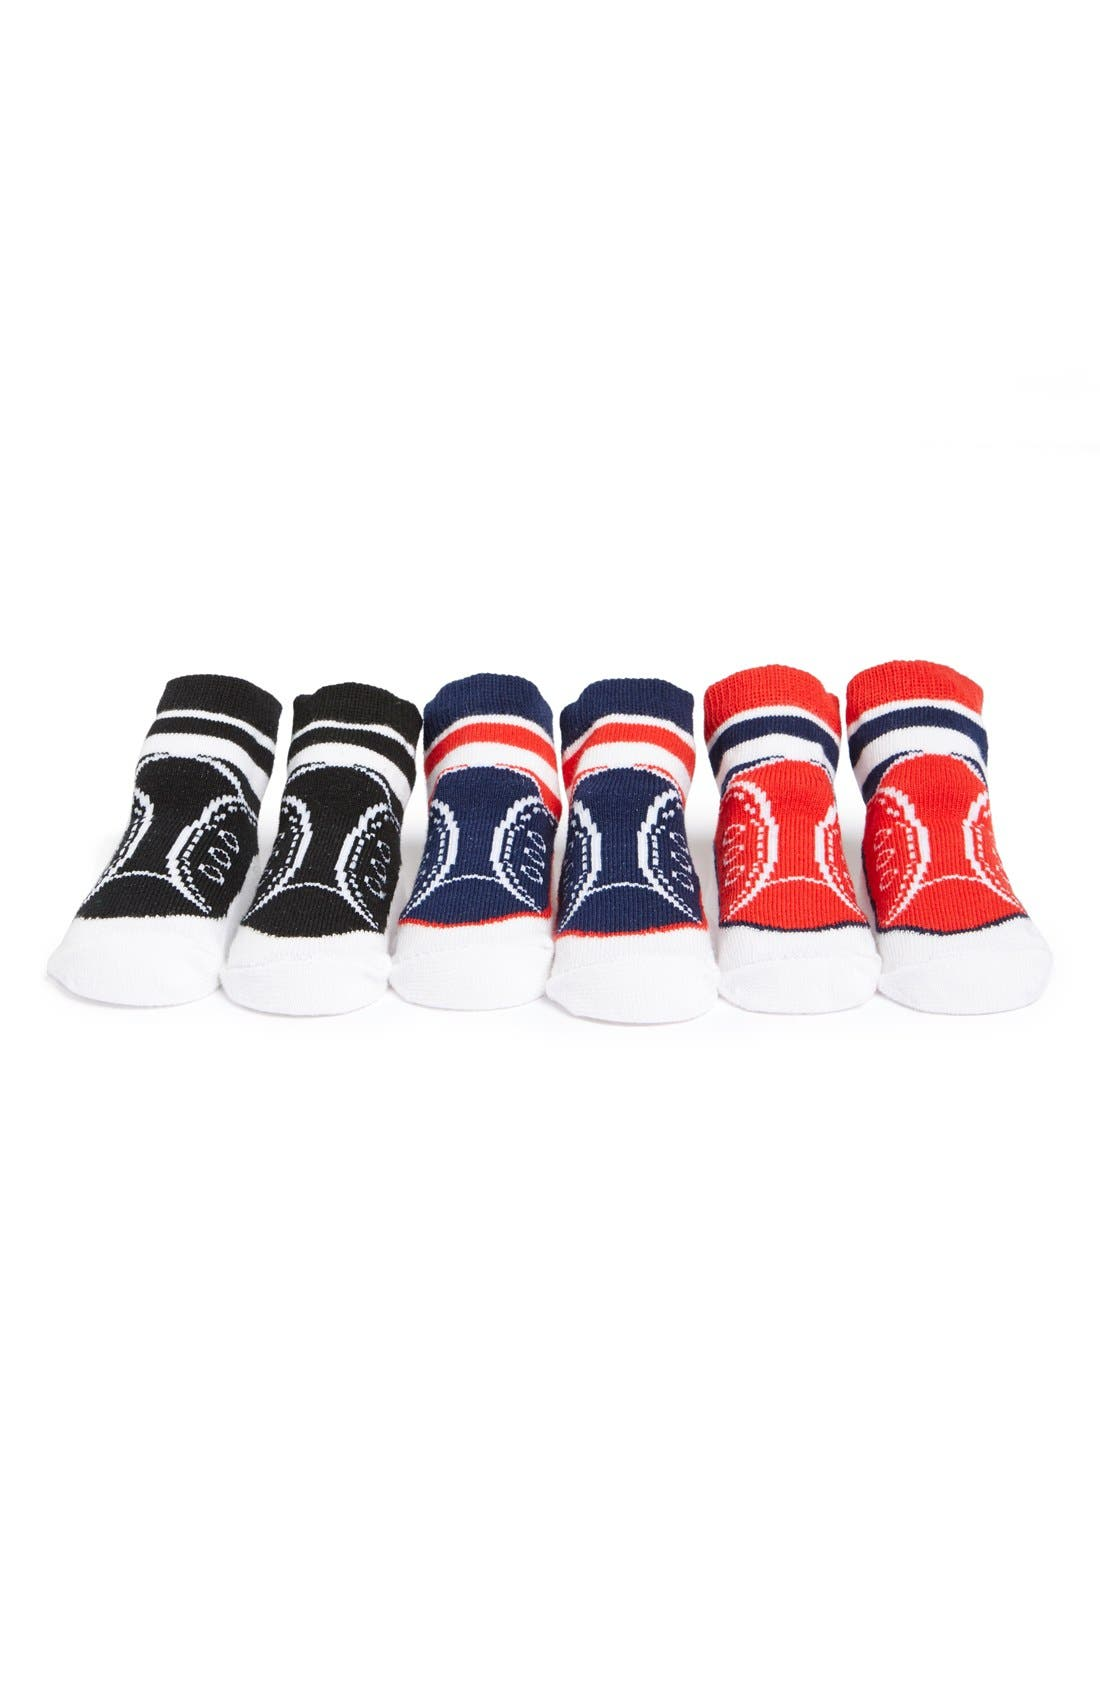 'Sport' Socks,                         Main,                         color, No Color